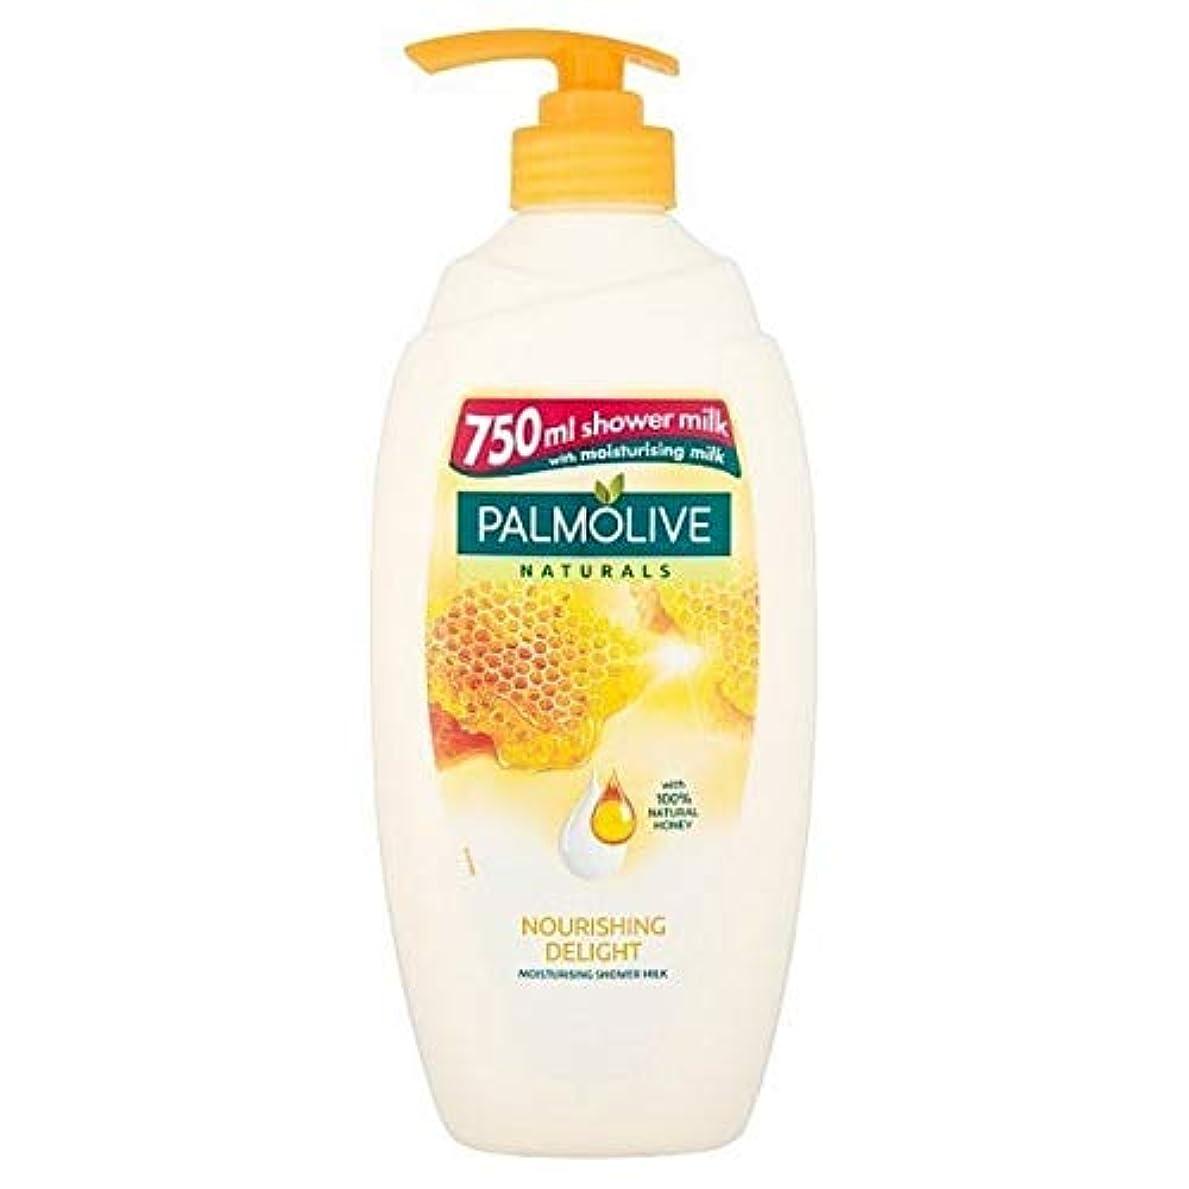 [Palmolive ] パルモライブナチュラルミルク&ハニーシャワージェルクリーム750ミリリットル - Palmolive Naturals Milk & Honey Shower Gel Cream 750ml [...